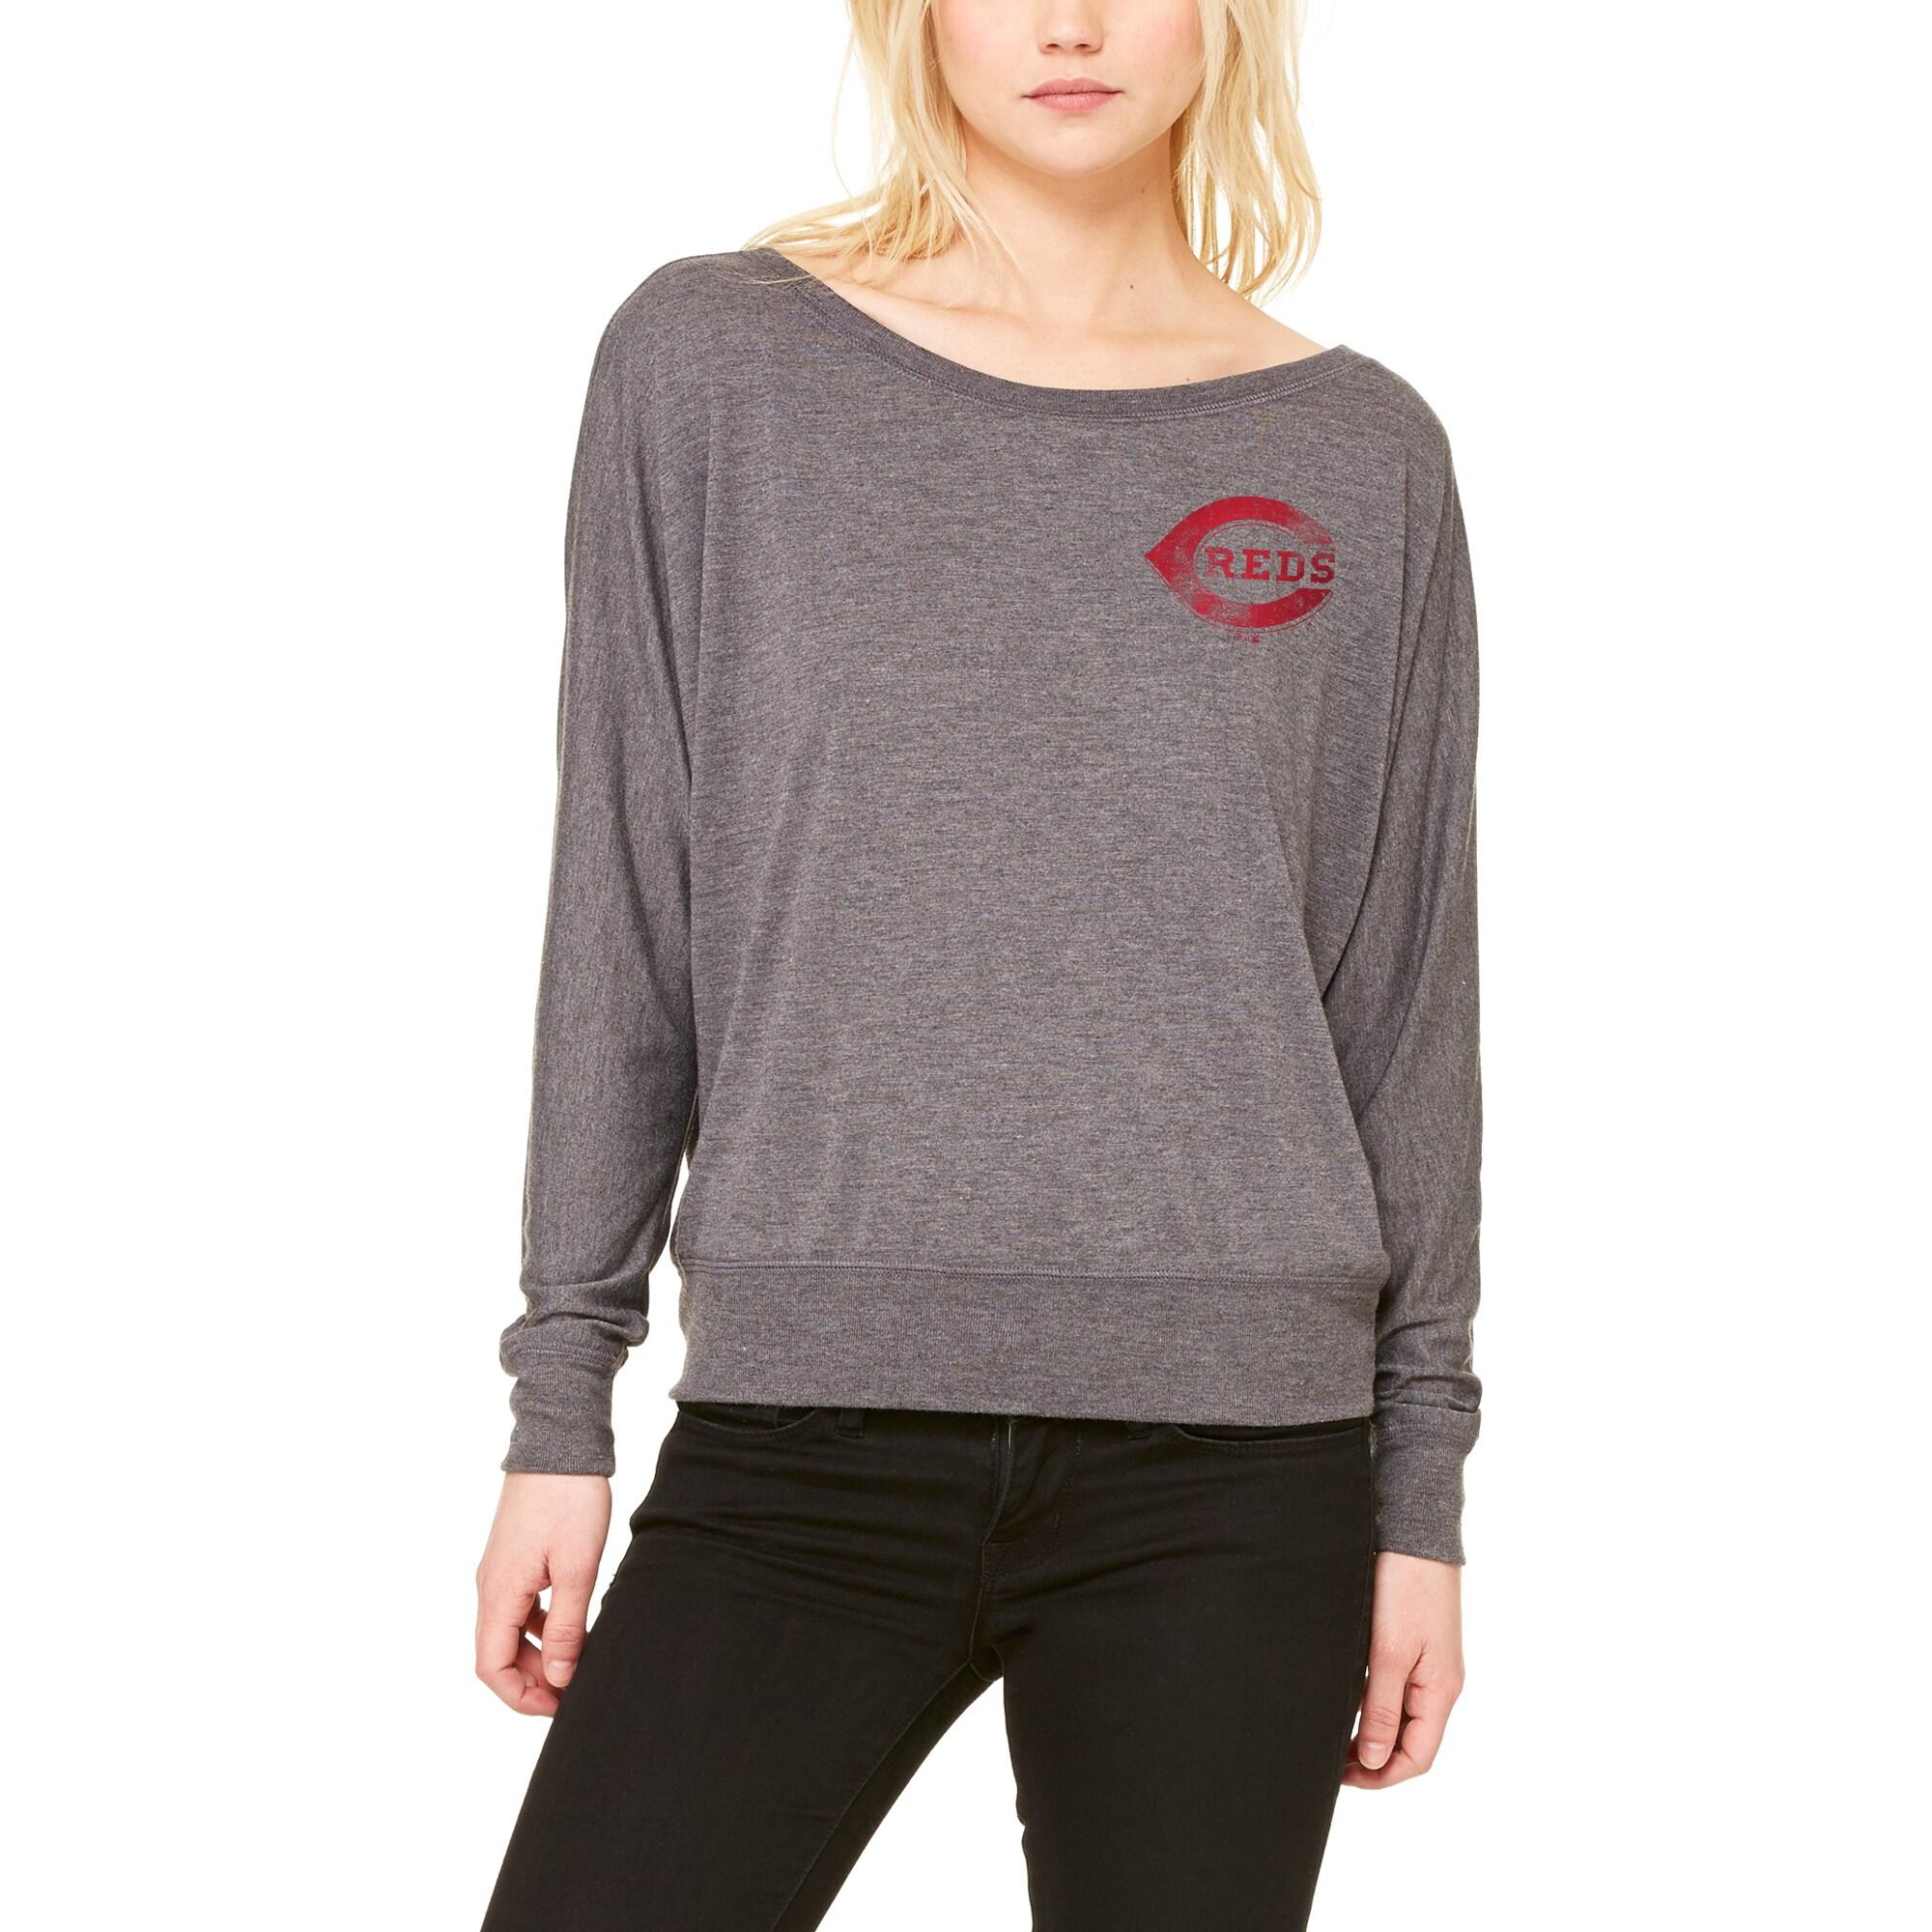 Cincinnati Reds Let Loose by RNL Women's Winning Off-Shoulder Long Sleeve T-Shirt - Dark Heathered Gray